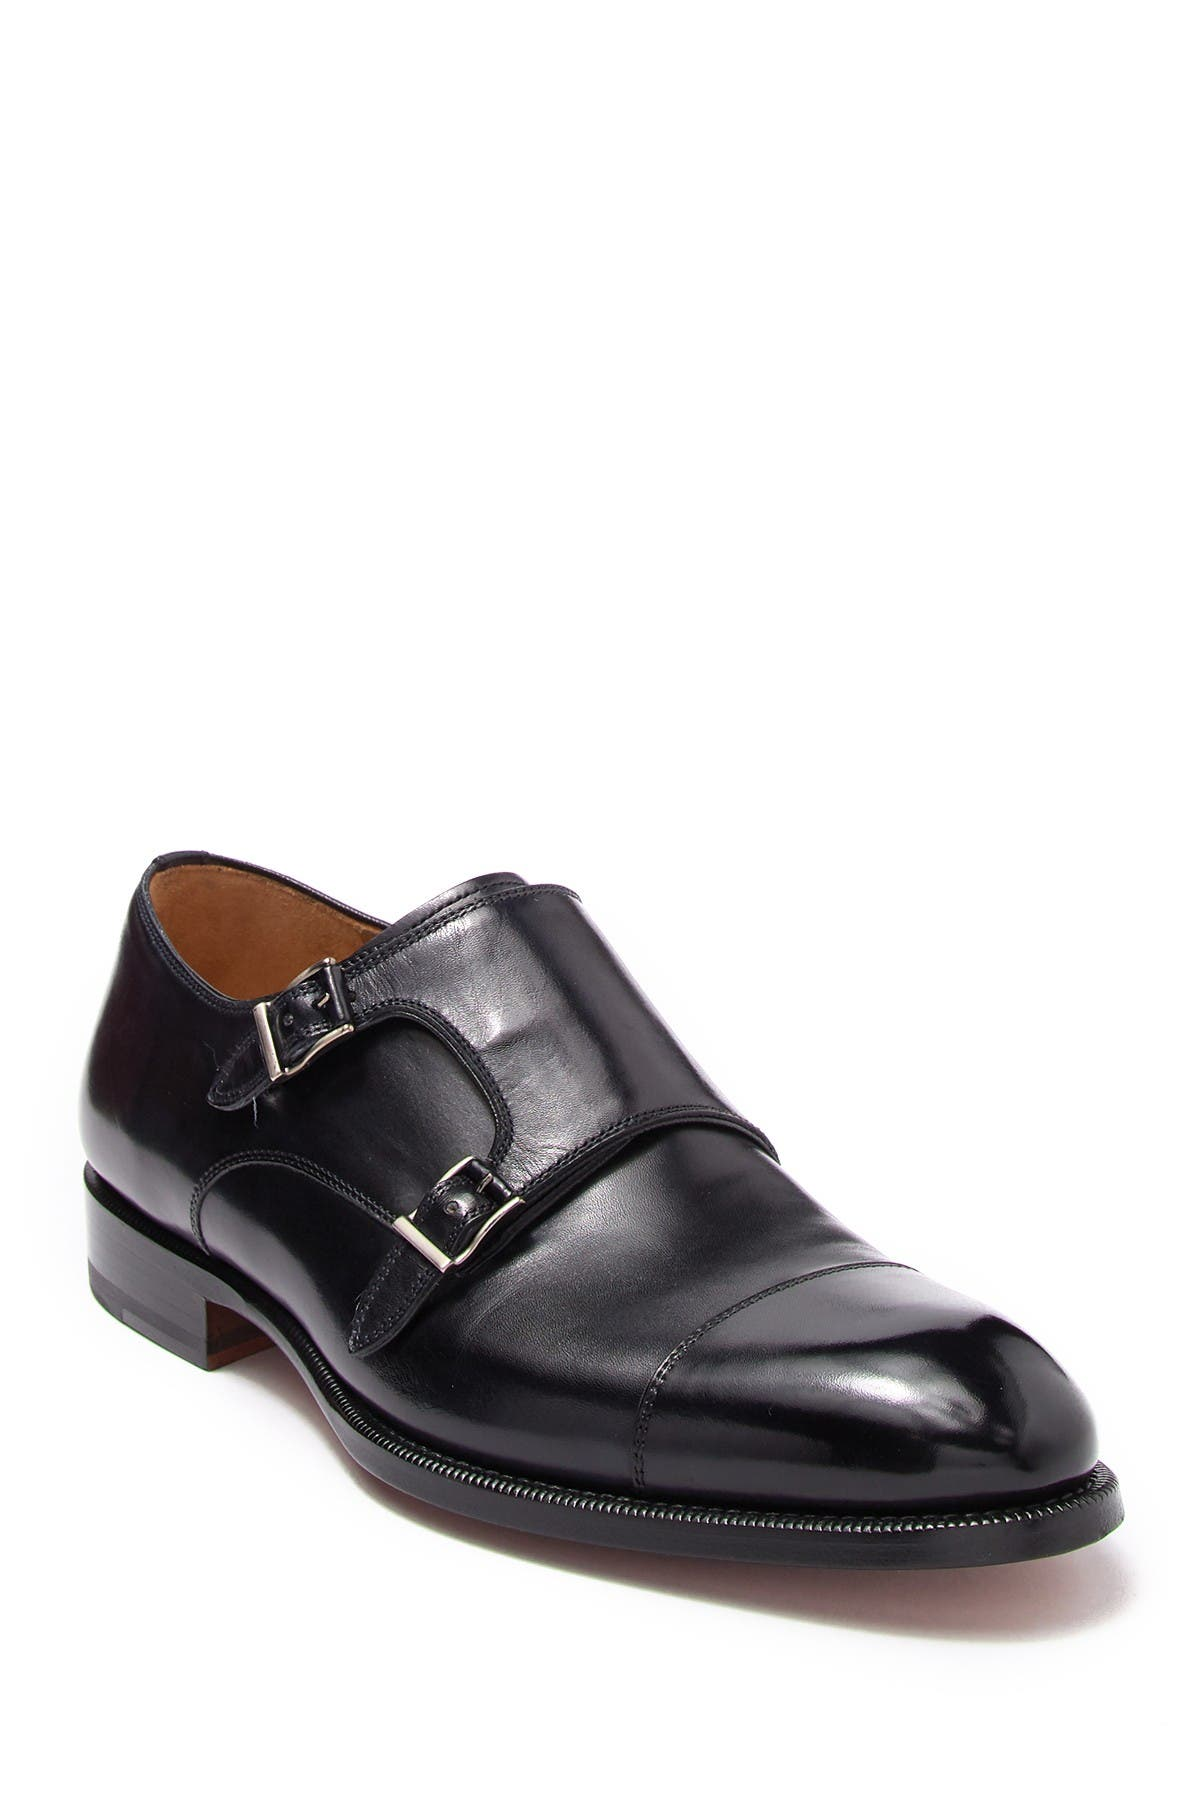 Image of Magnanni Leather Monk Strap Cap Toe Dress Shoe